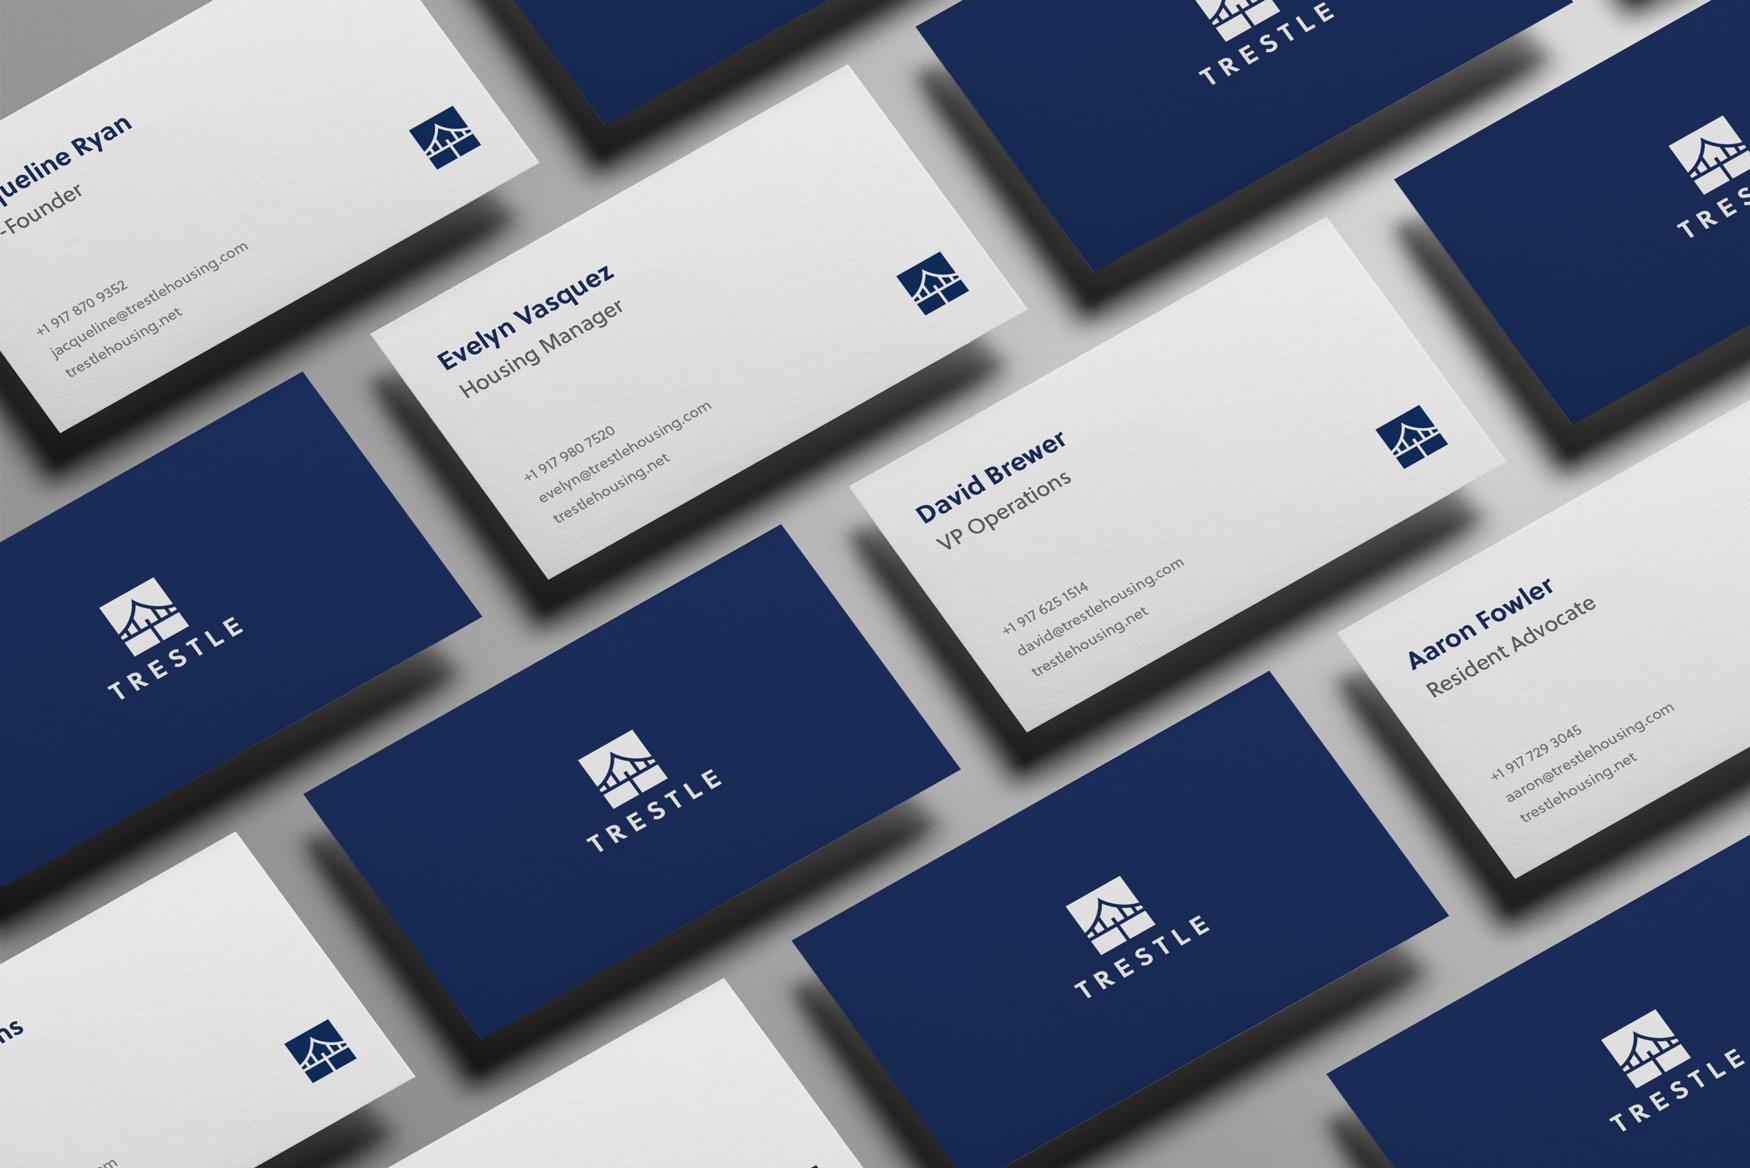 Eric_Holton_Business_Cards.jpg